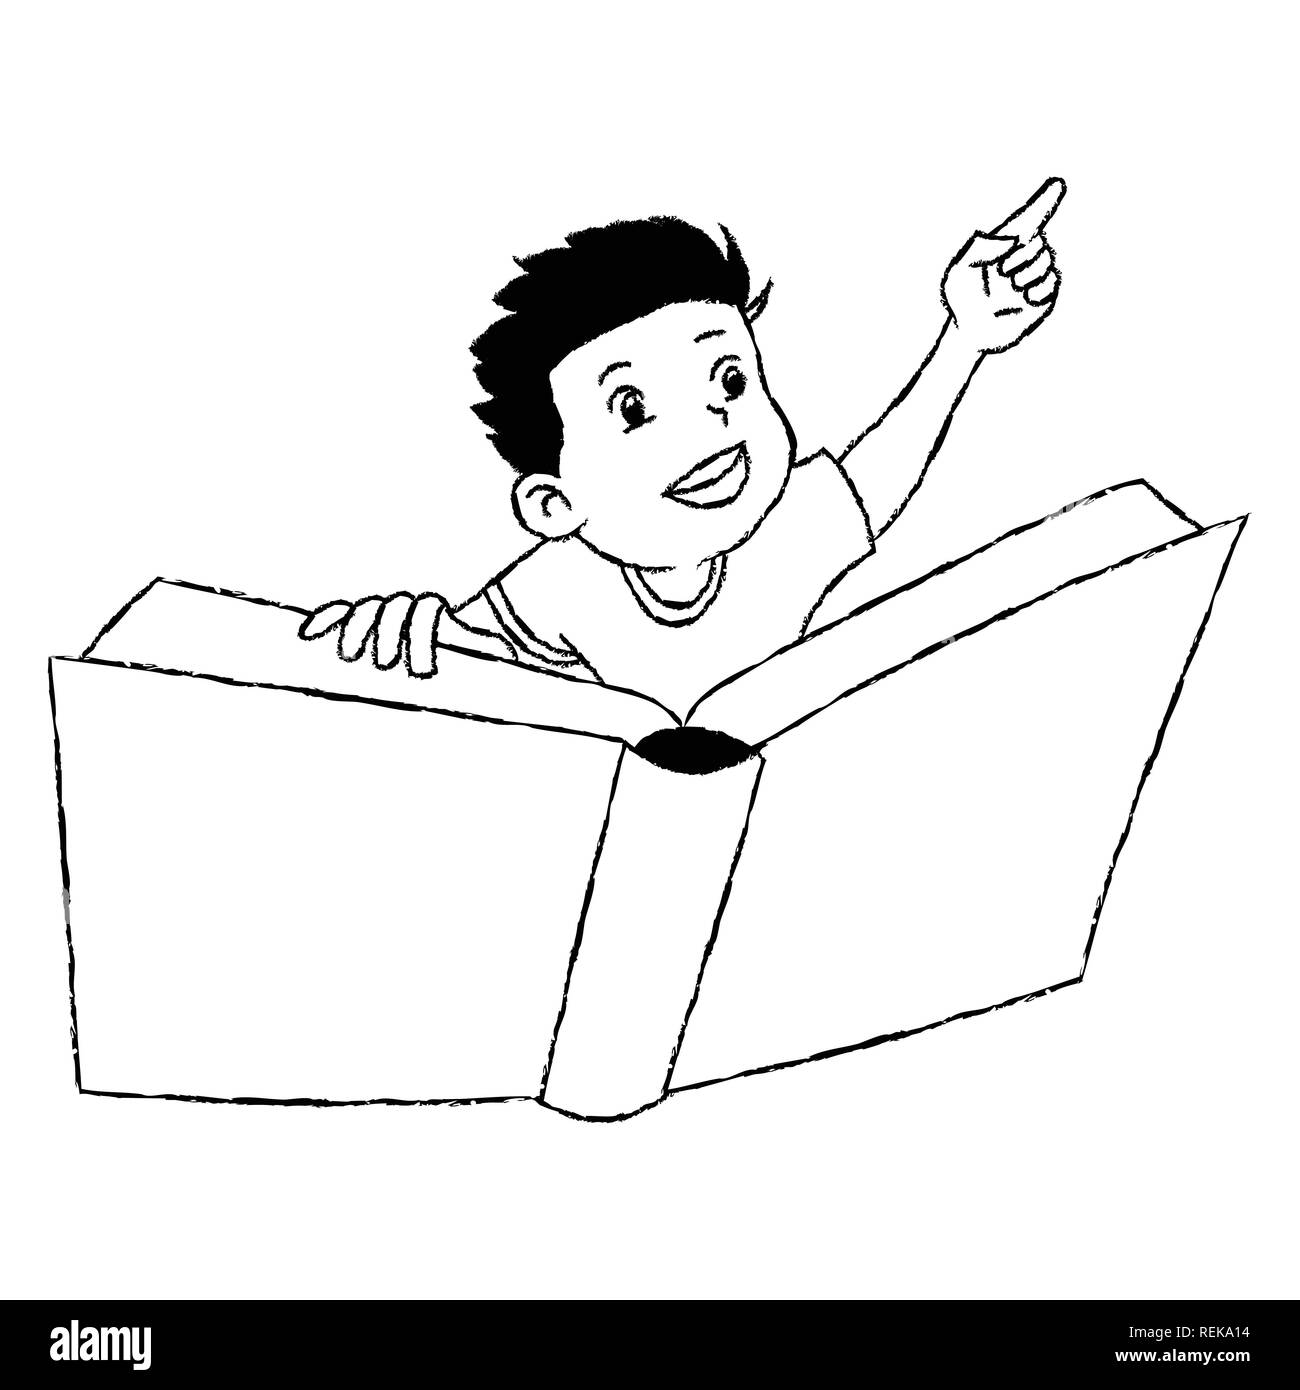 Chico Volando Libro Aislado Sobre Fondo Blanco Dibujados A